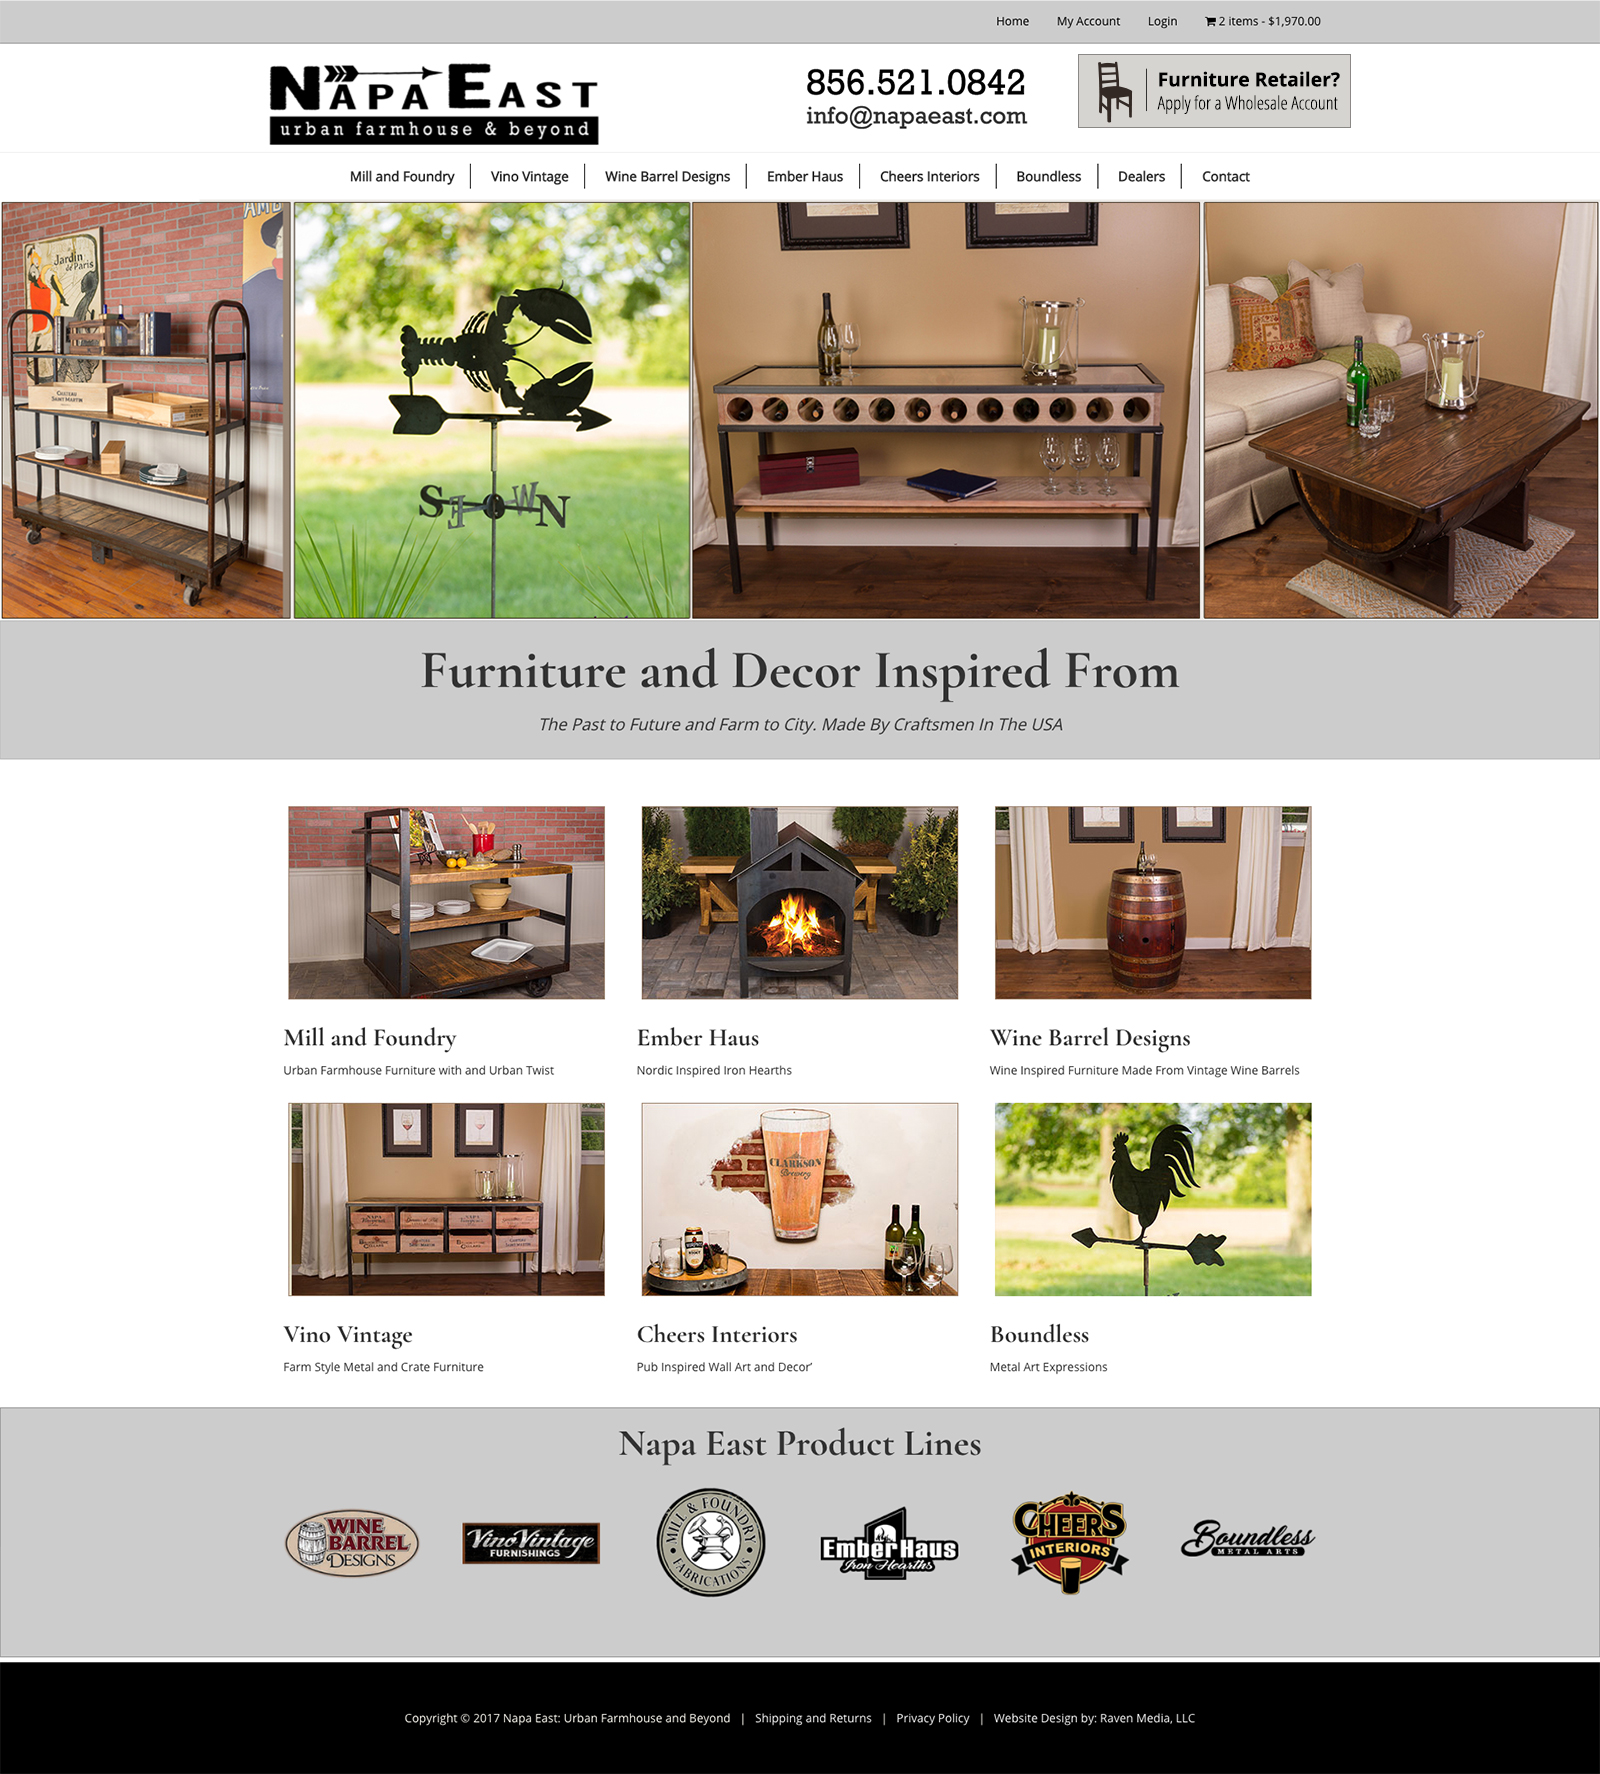 Napa East Website Design